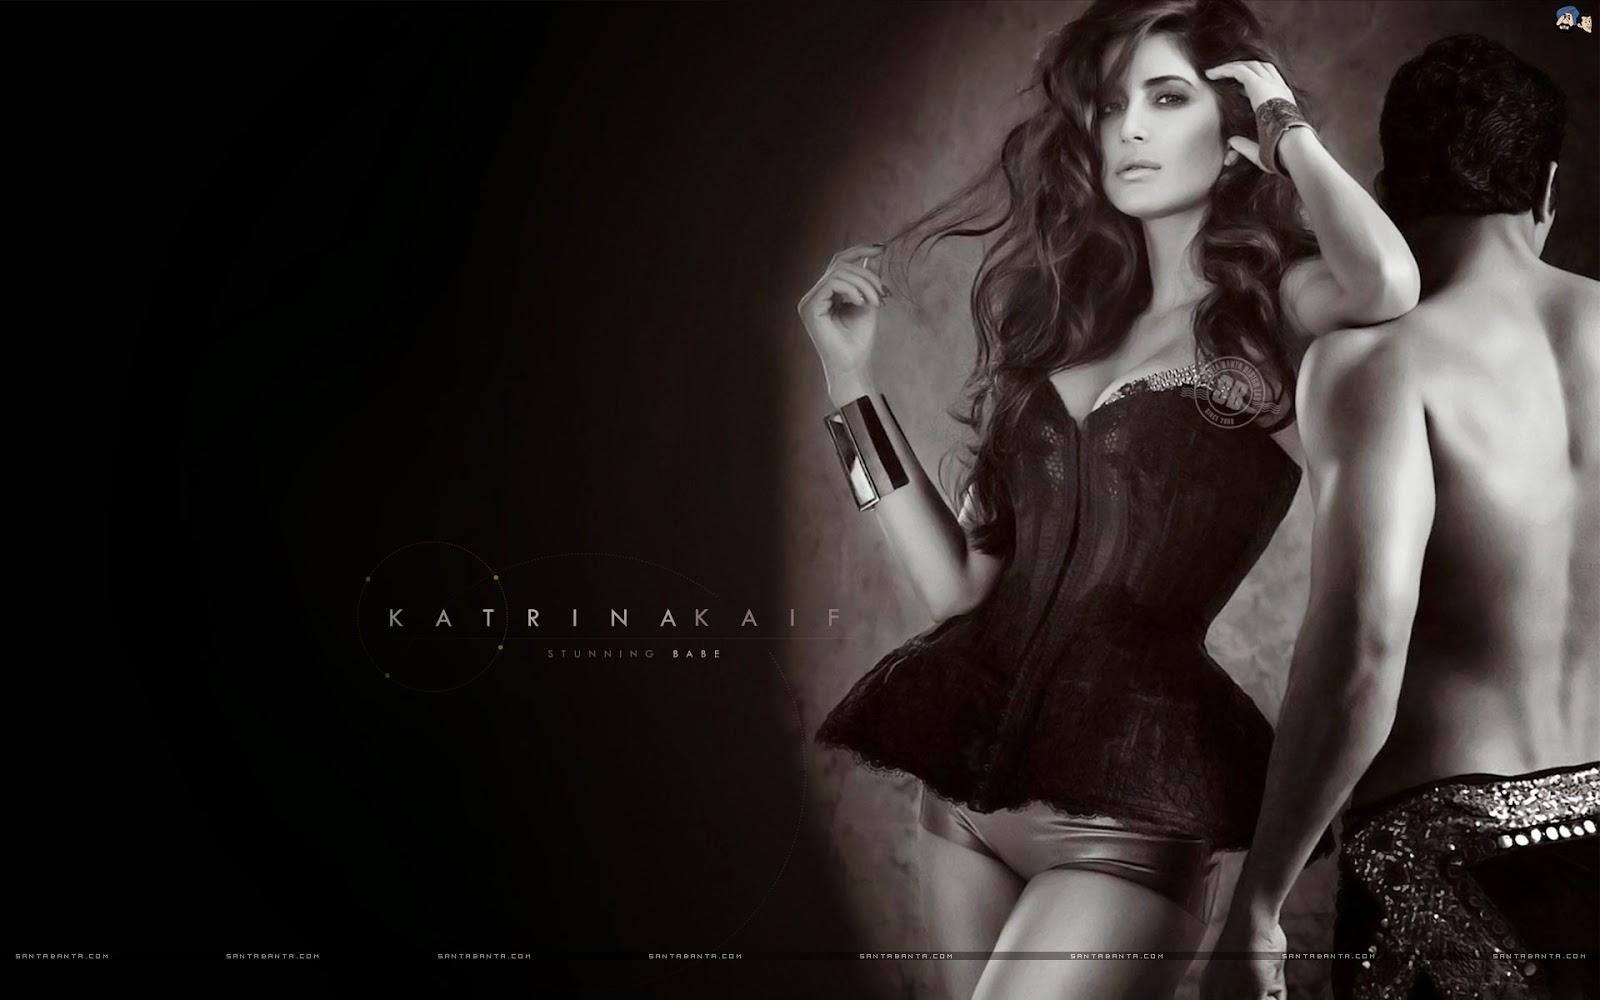 Katrina Kaif Seksi Wallpaper 3